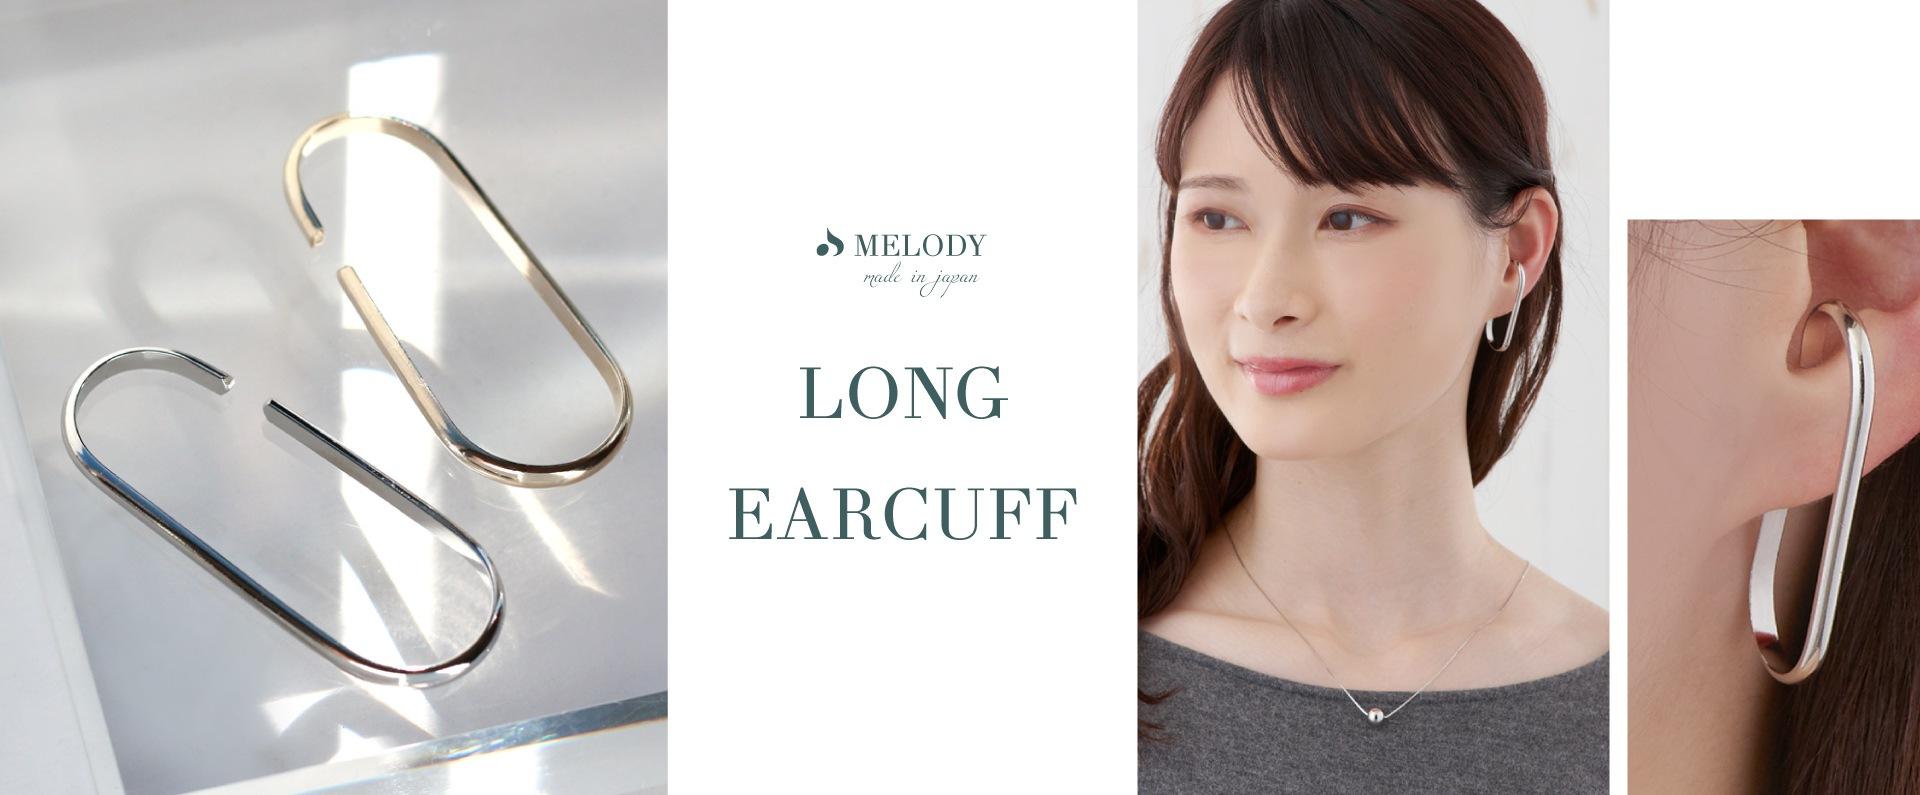 long_earcuff